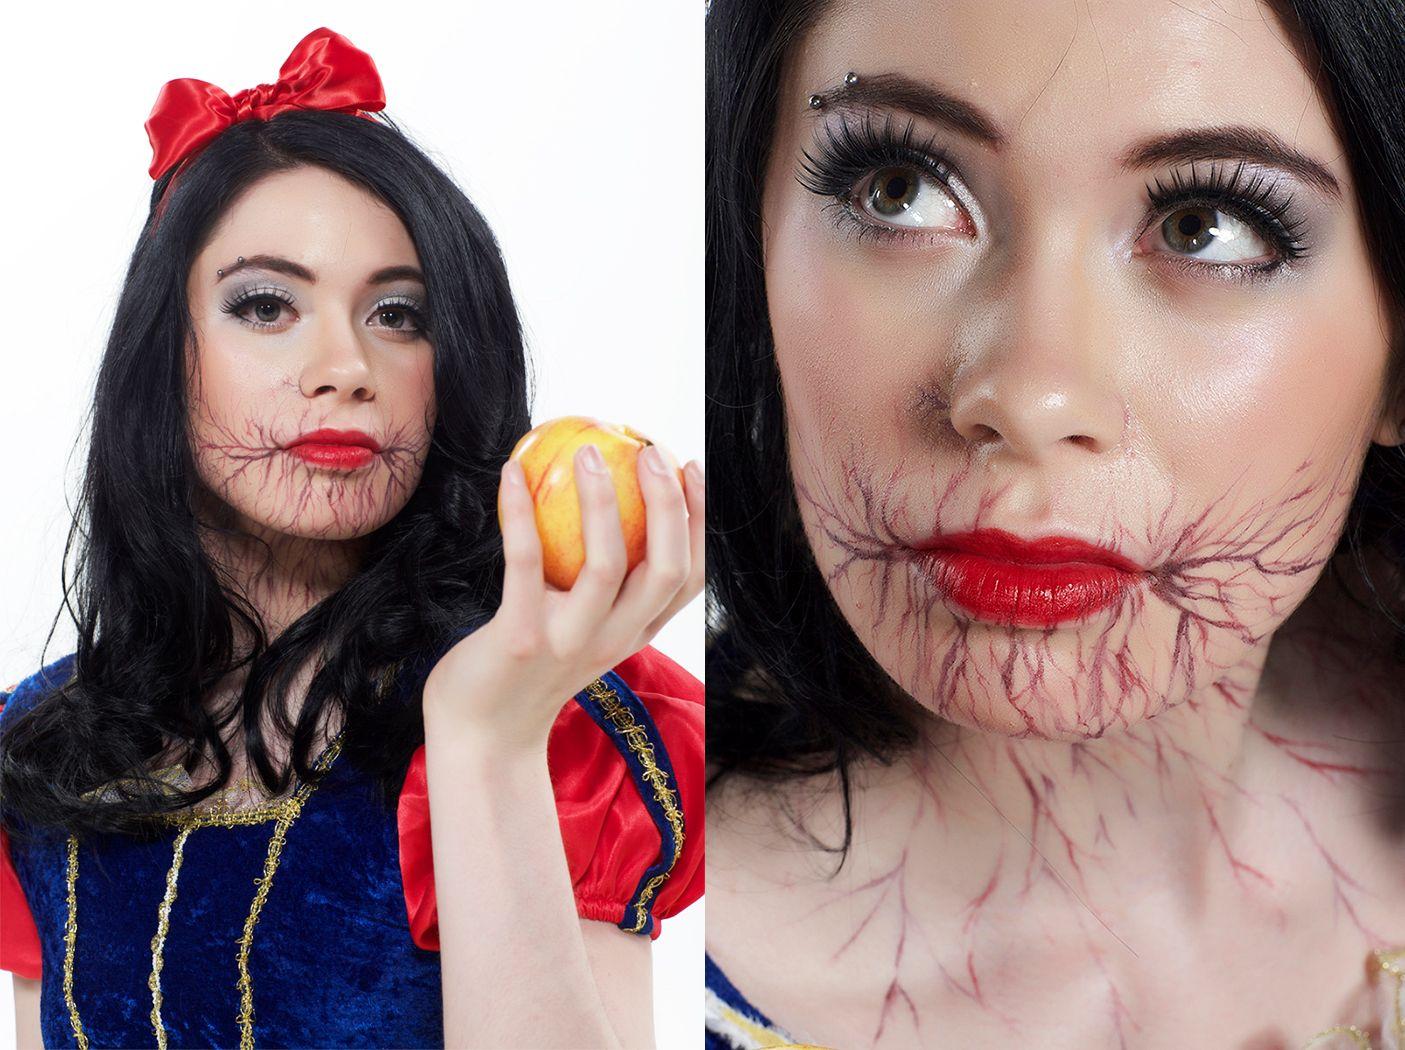 poisoned snow white - Google Search   Makeup   Pinterest   Snow ...